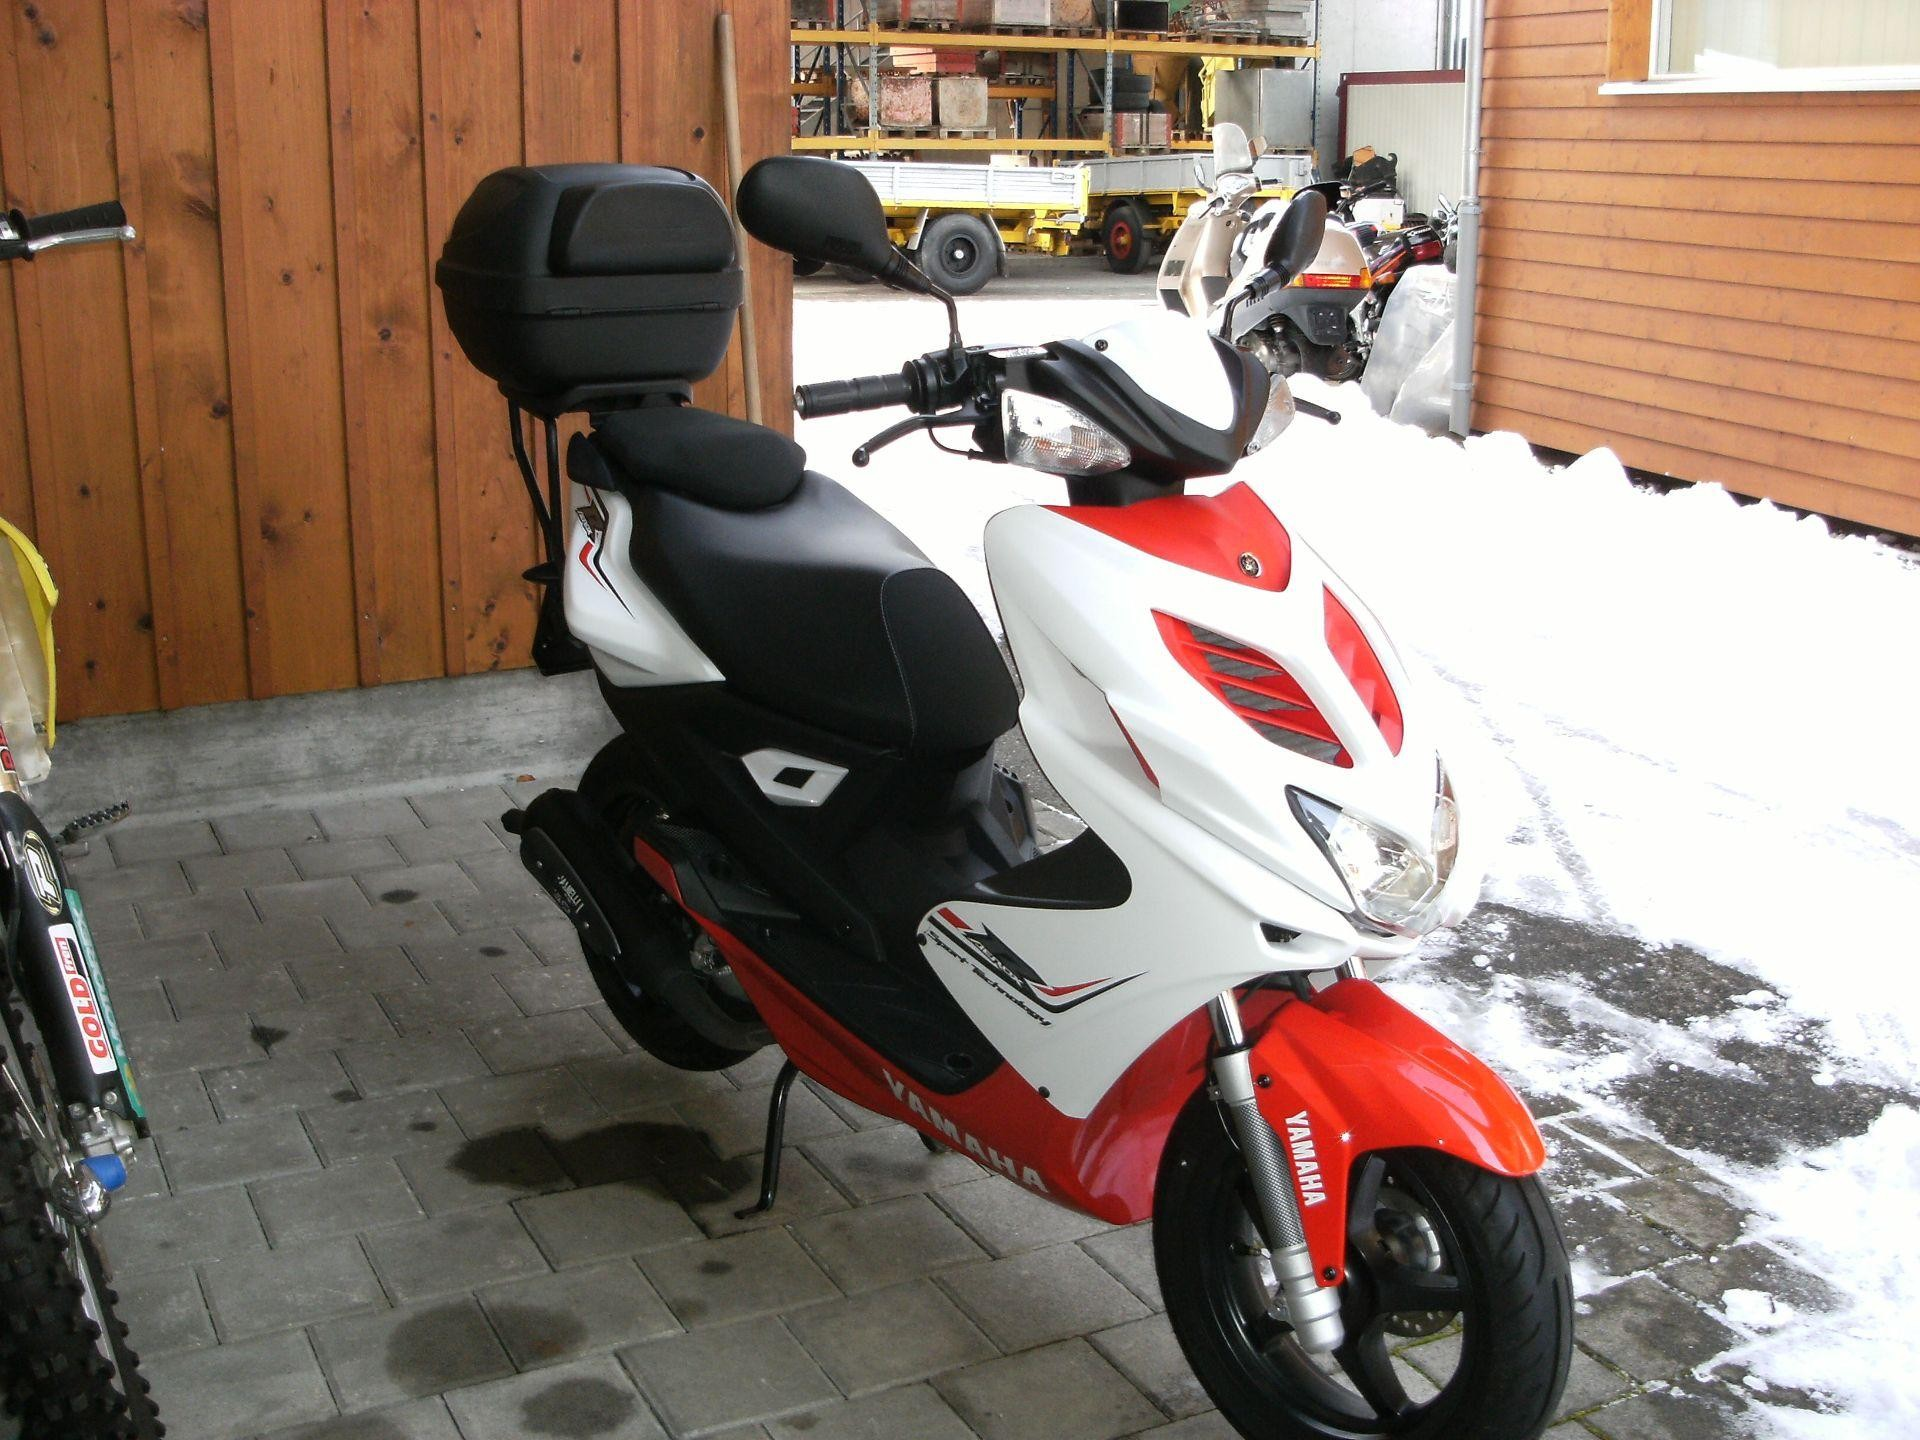 Motorrad Occasion kaufen YAMAHA Aerox R NS 50 Fries 2-Rad